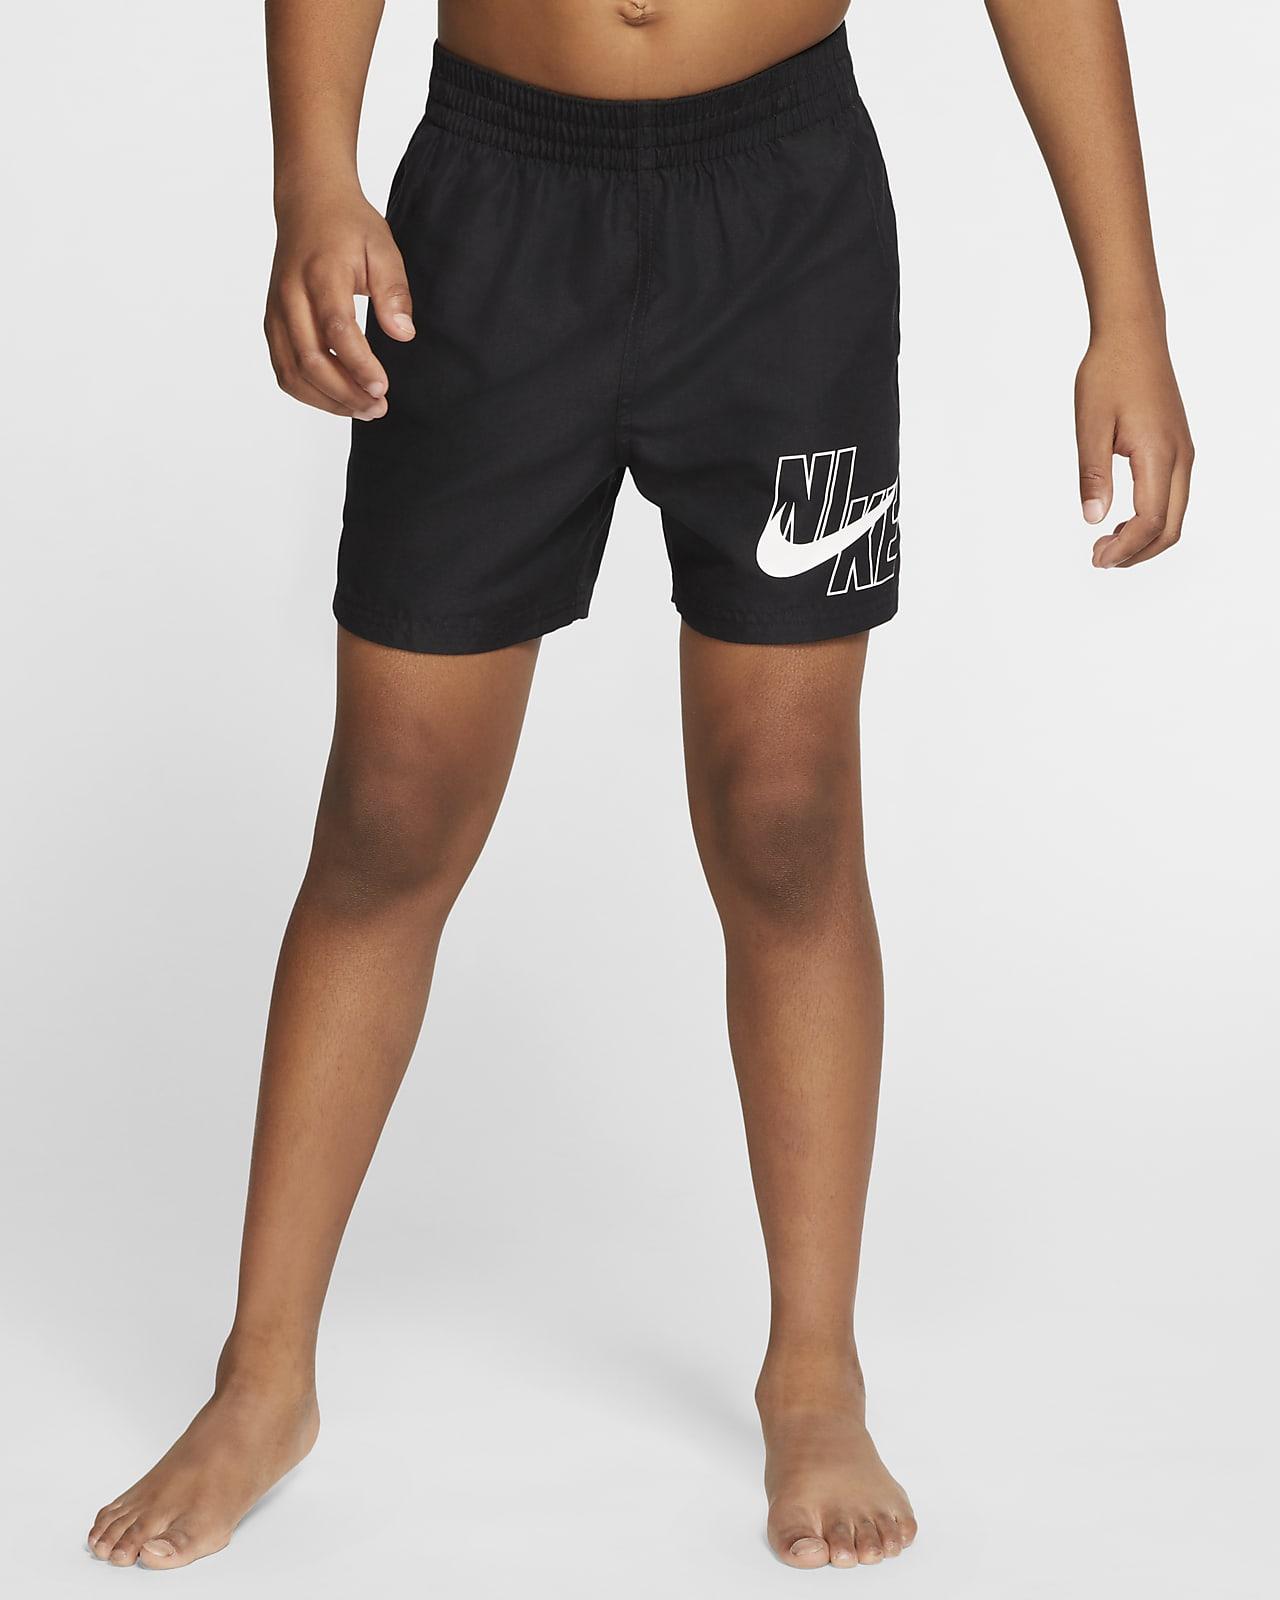 Nike Lap 4 Older Kids' (Boys') Swim Shorts